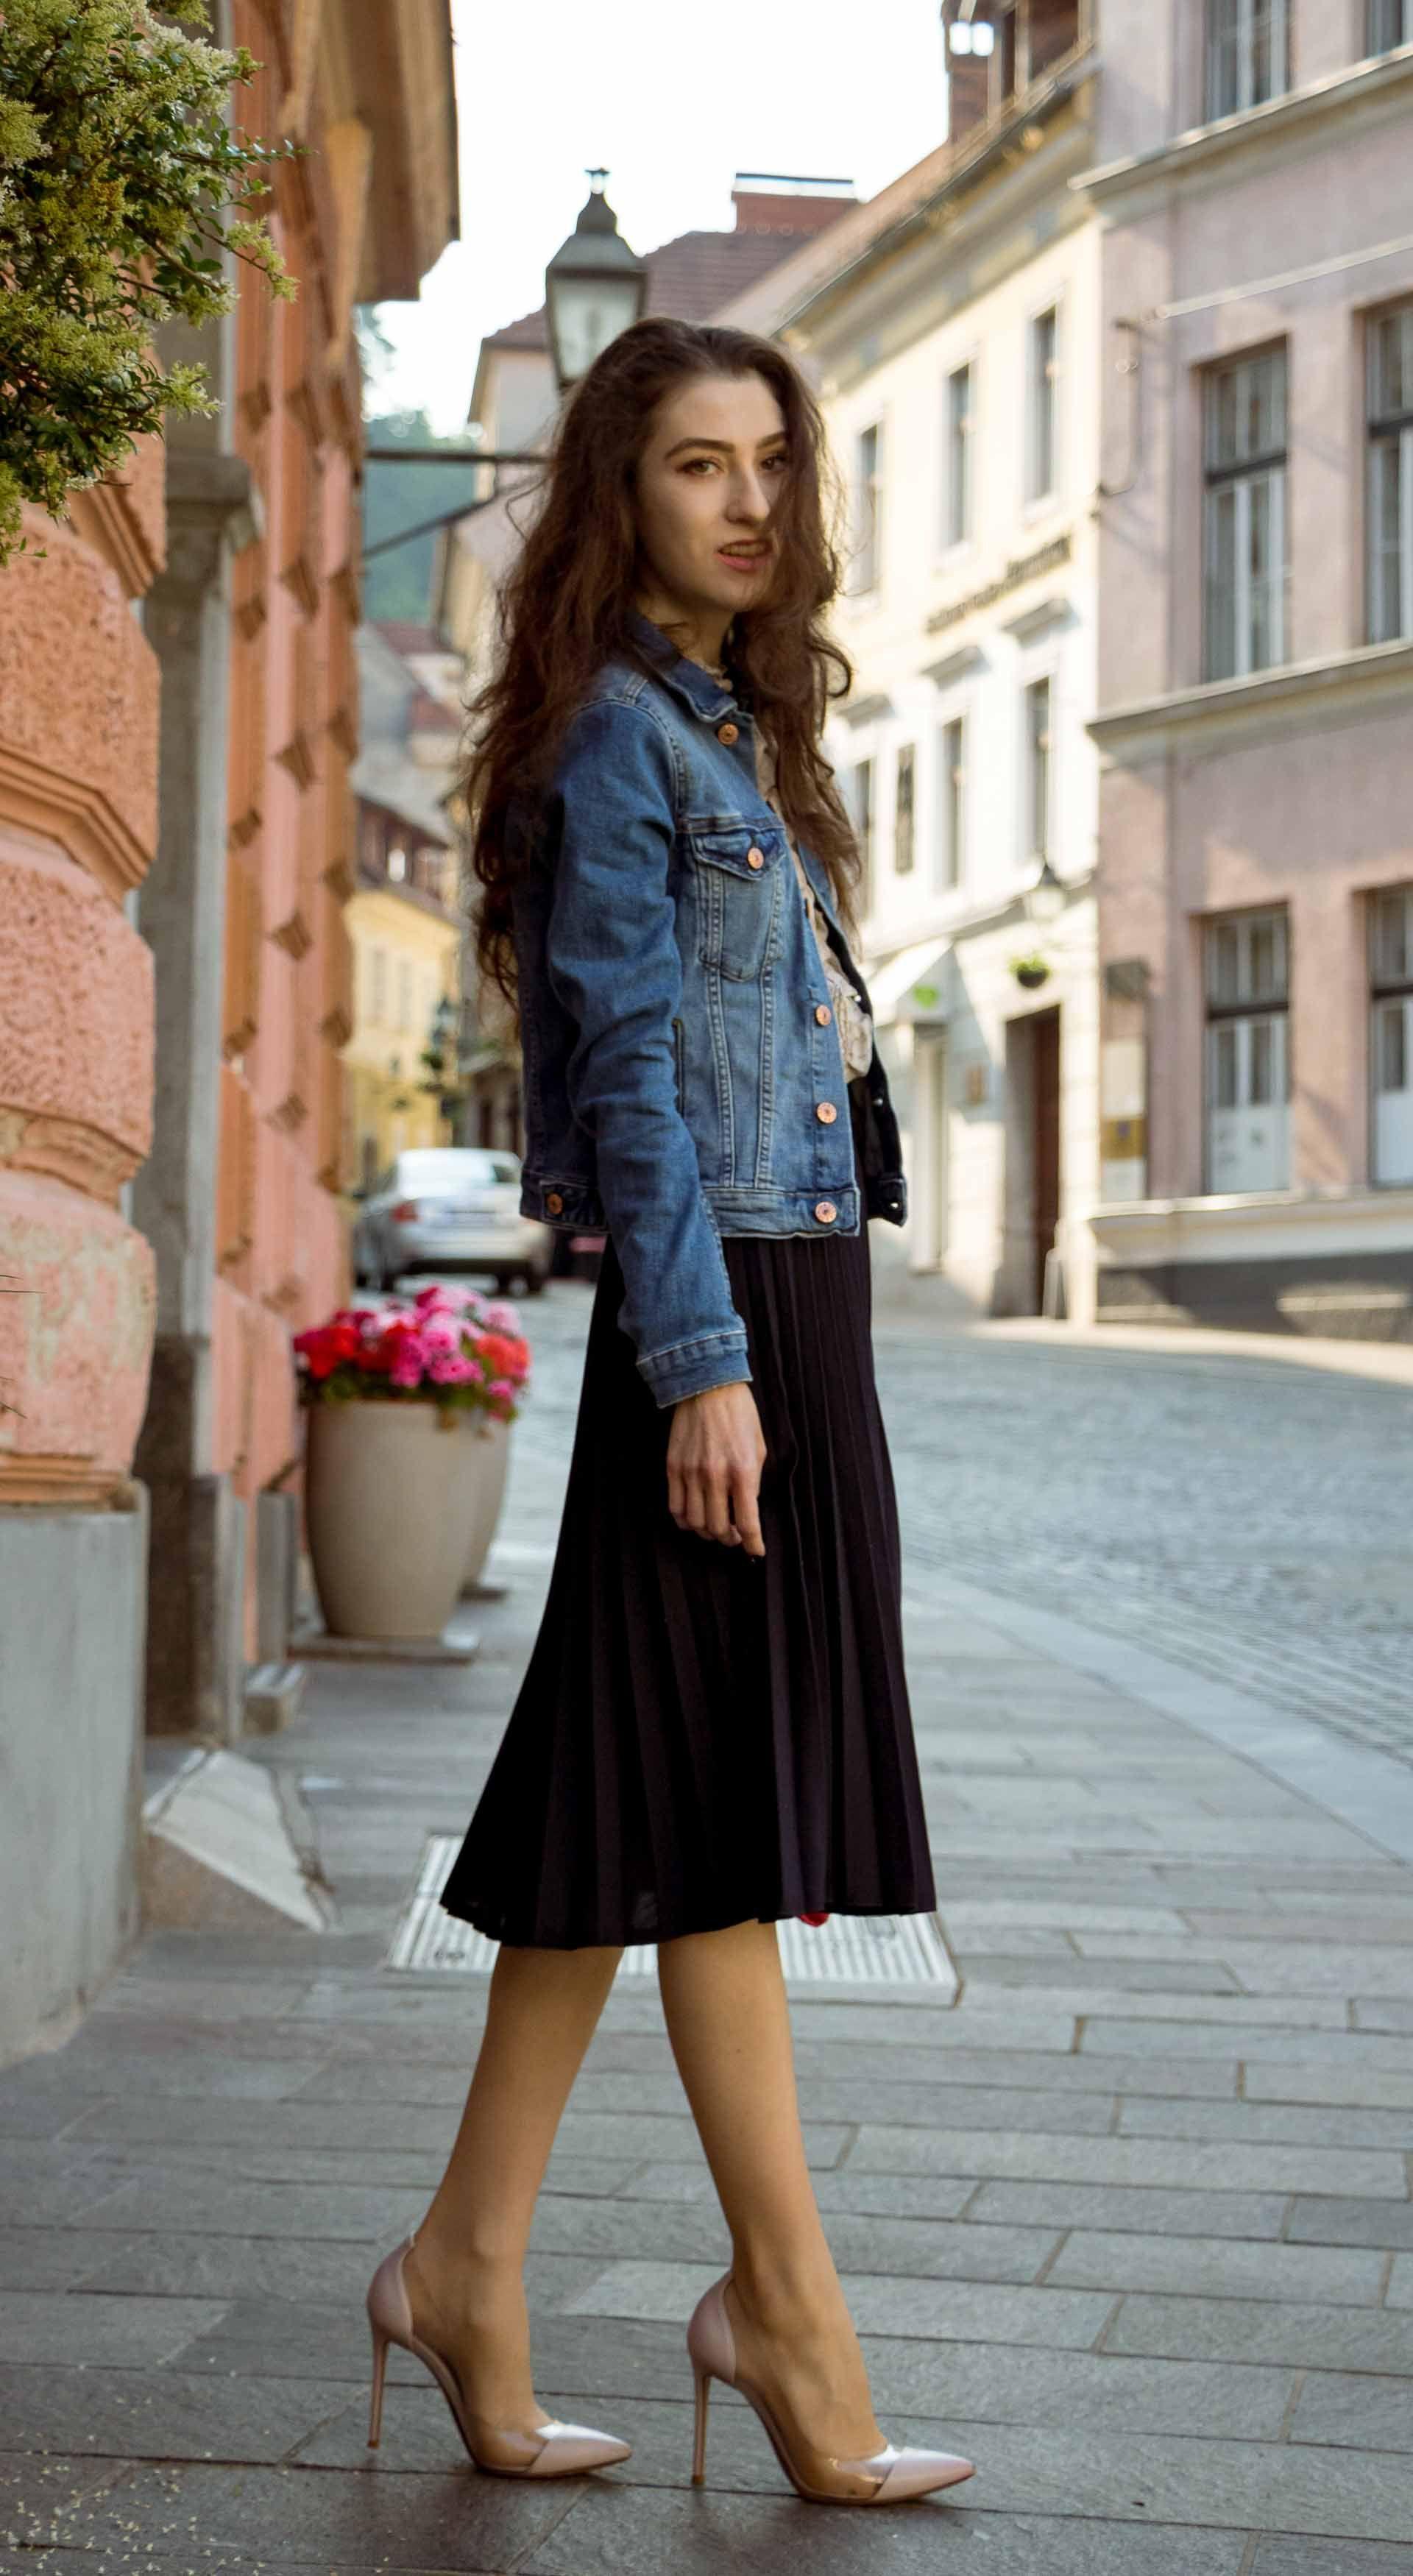 3177f488cf Veronika Lipar Fashion Blogger of Brunette from Wall Street wearing H&M  denim jacket, floral blouse